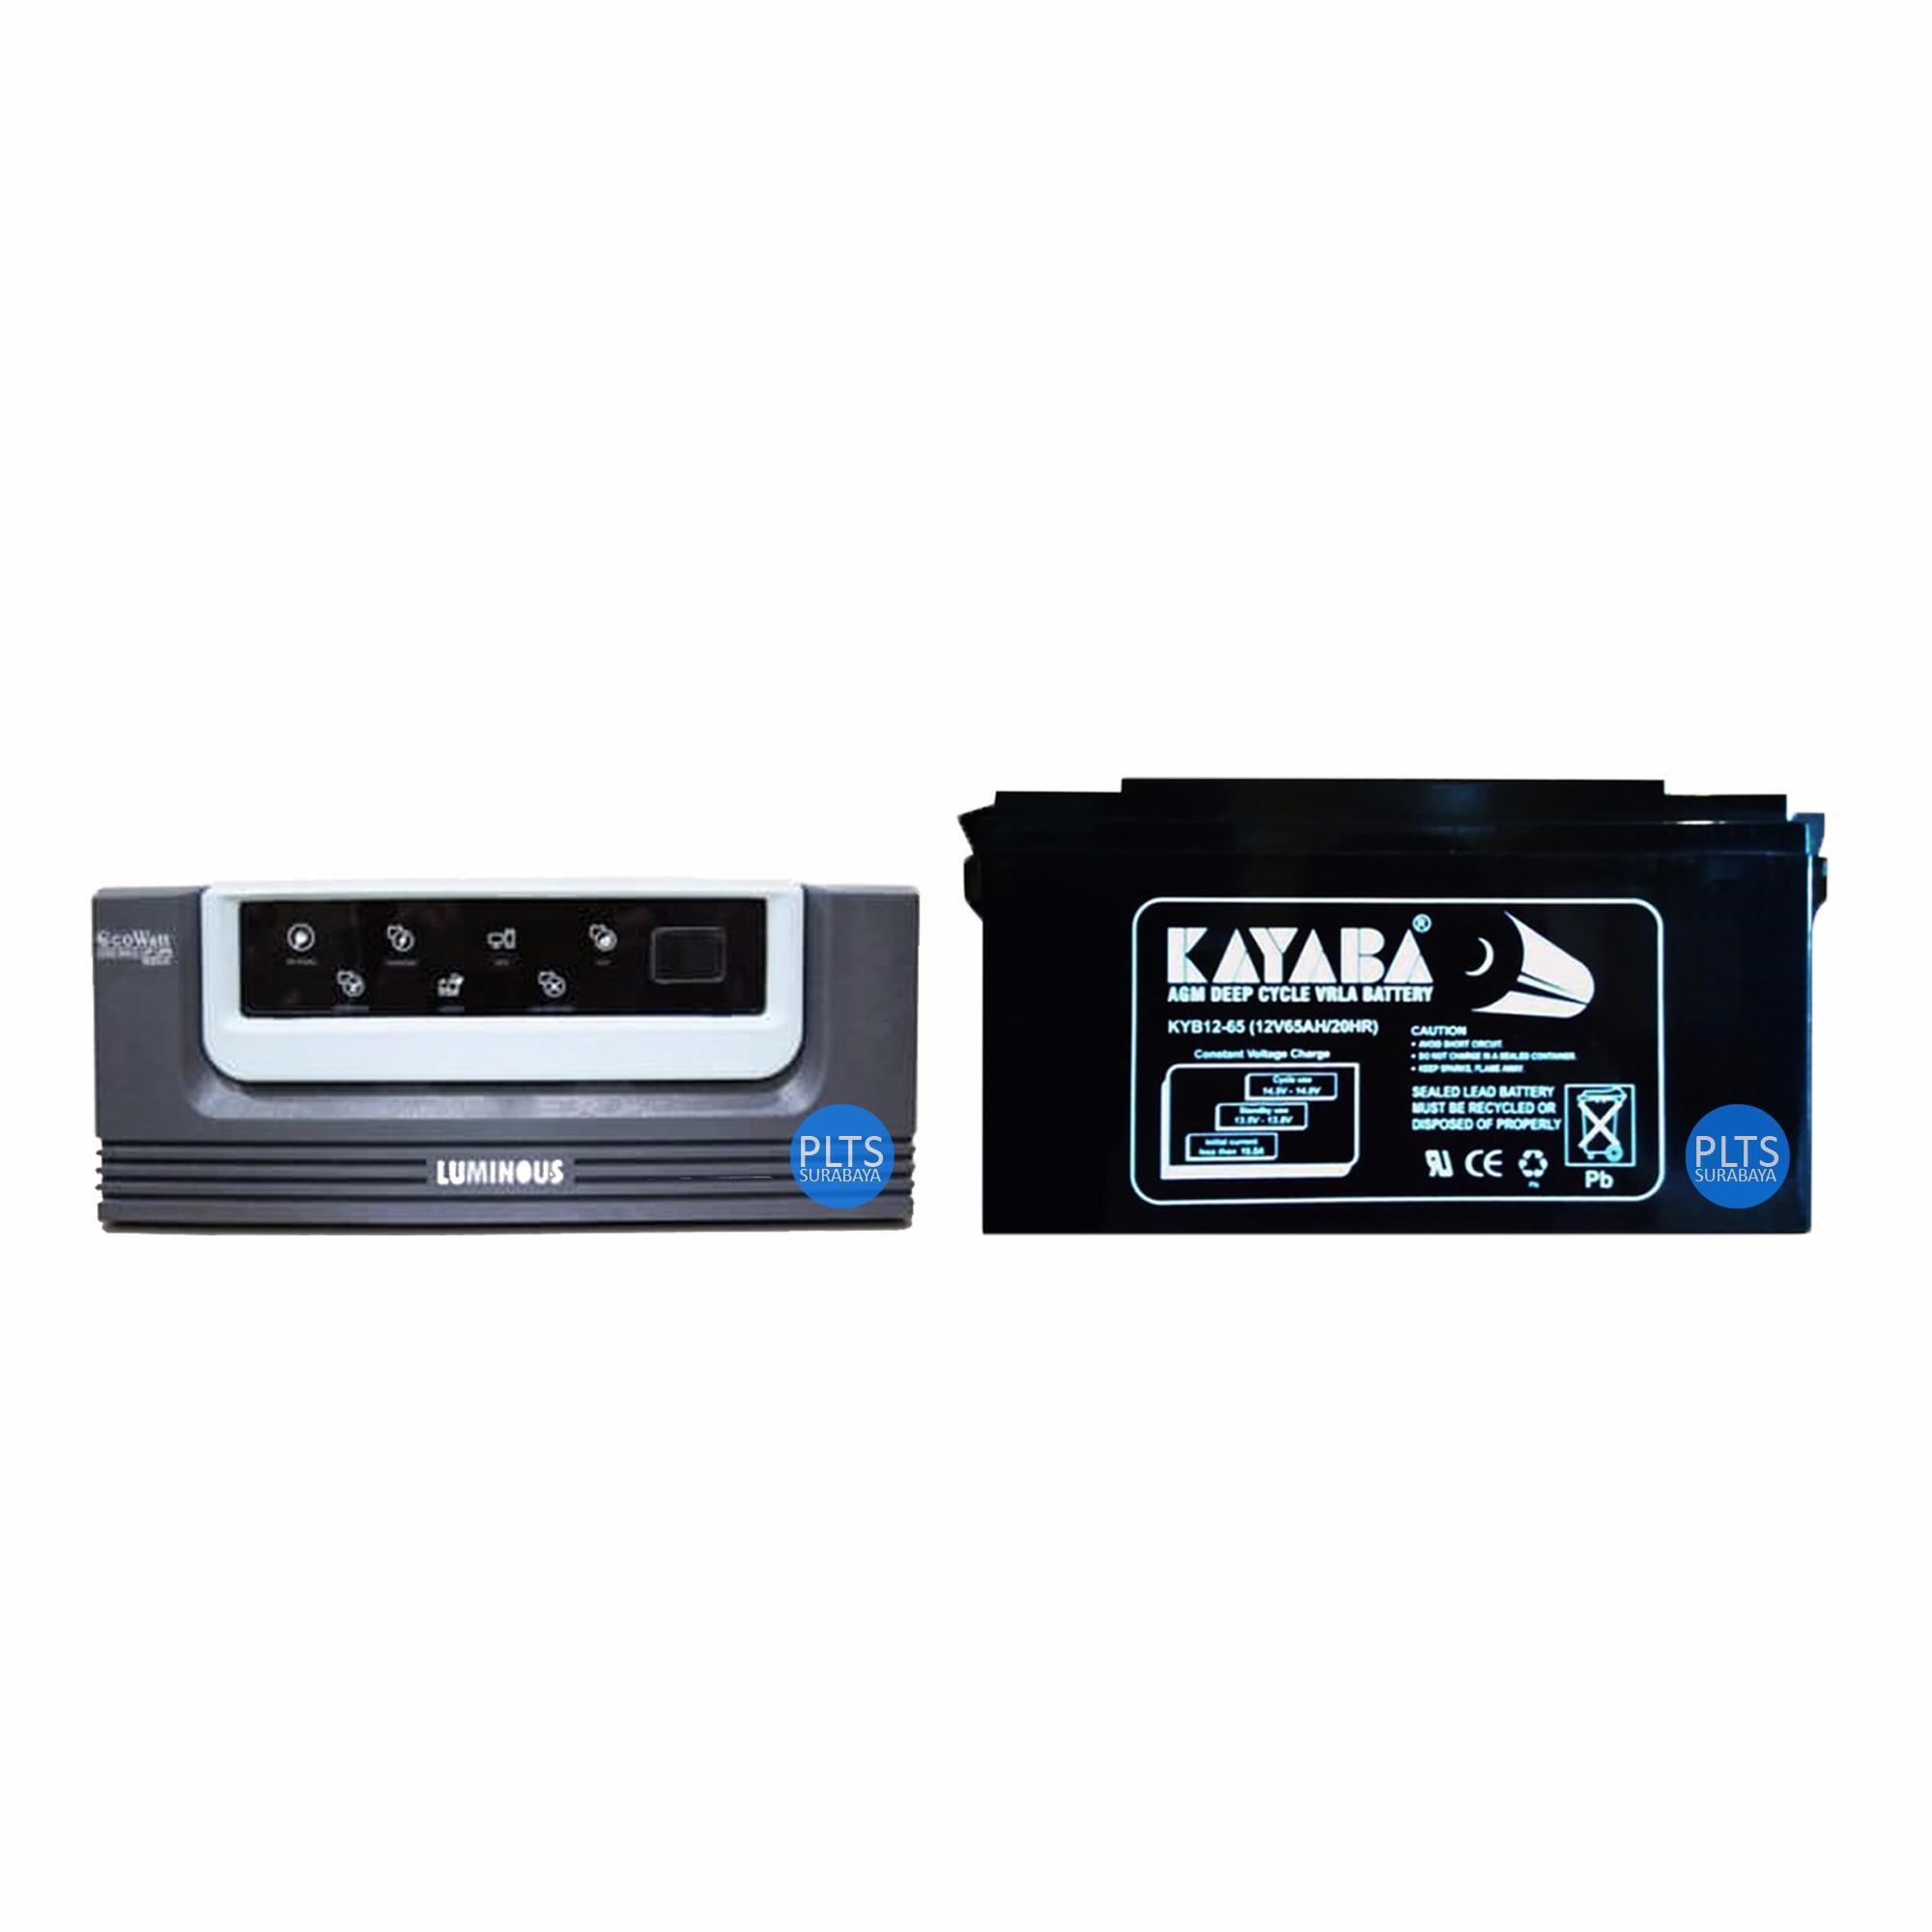 Paket Hemat Inverter Luminous Ecowatt 700VA + Aki Kering VRLA KAYABA 12v 65AH